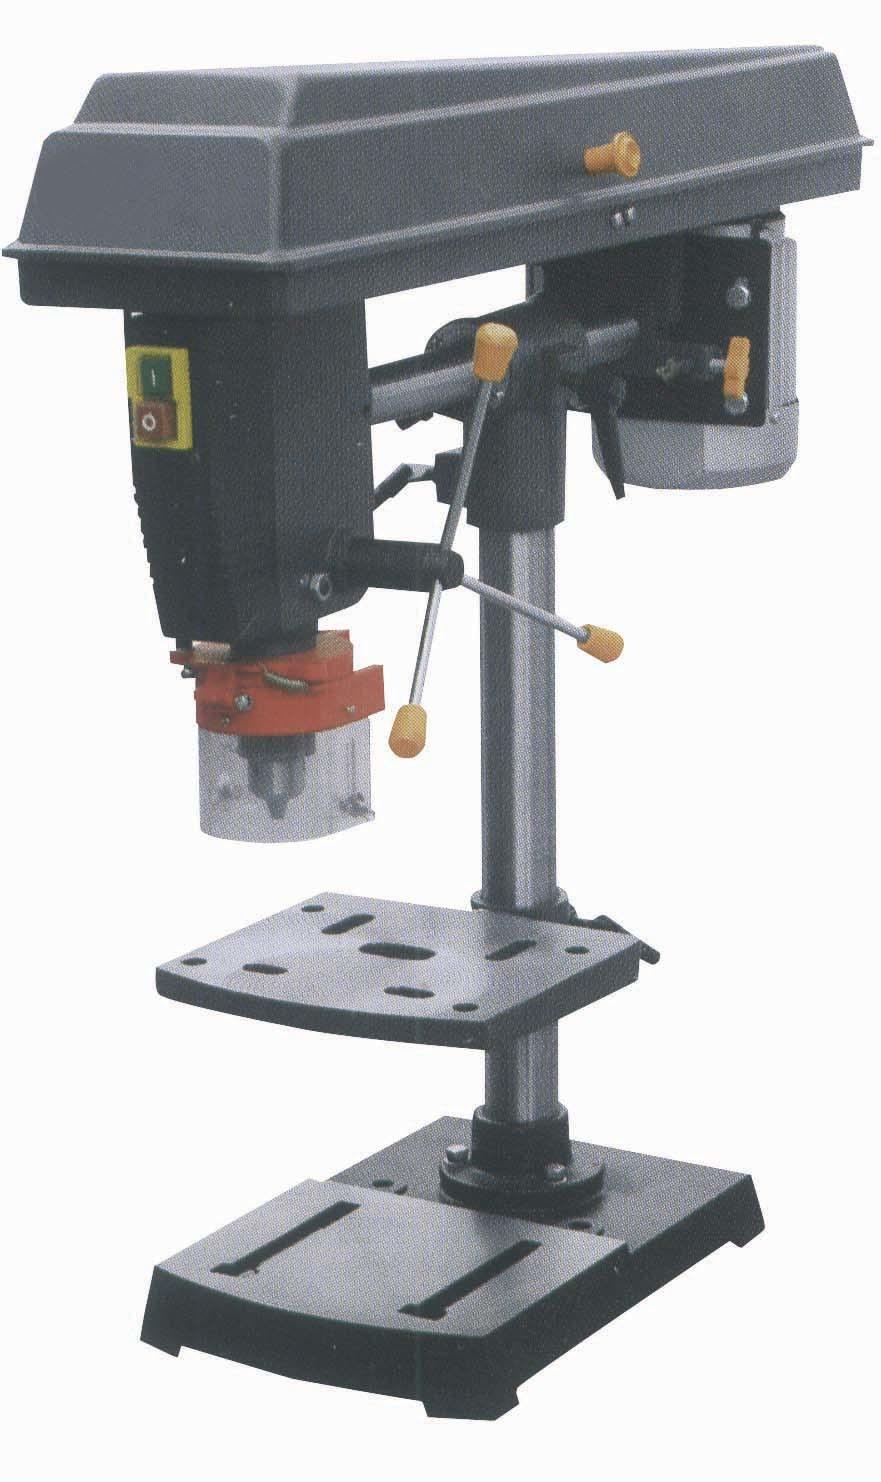 Wood Drill Press for Pinterest